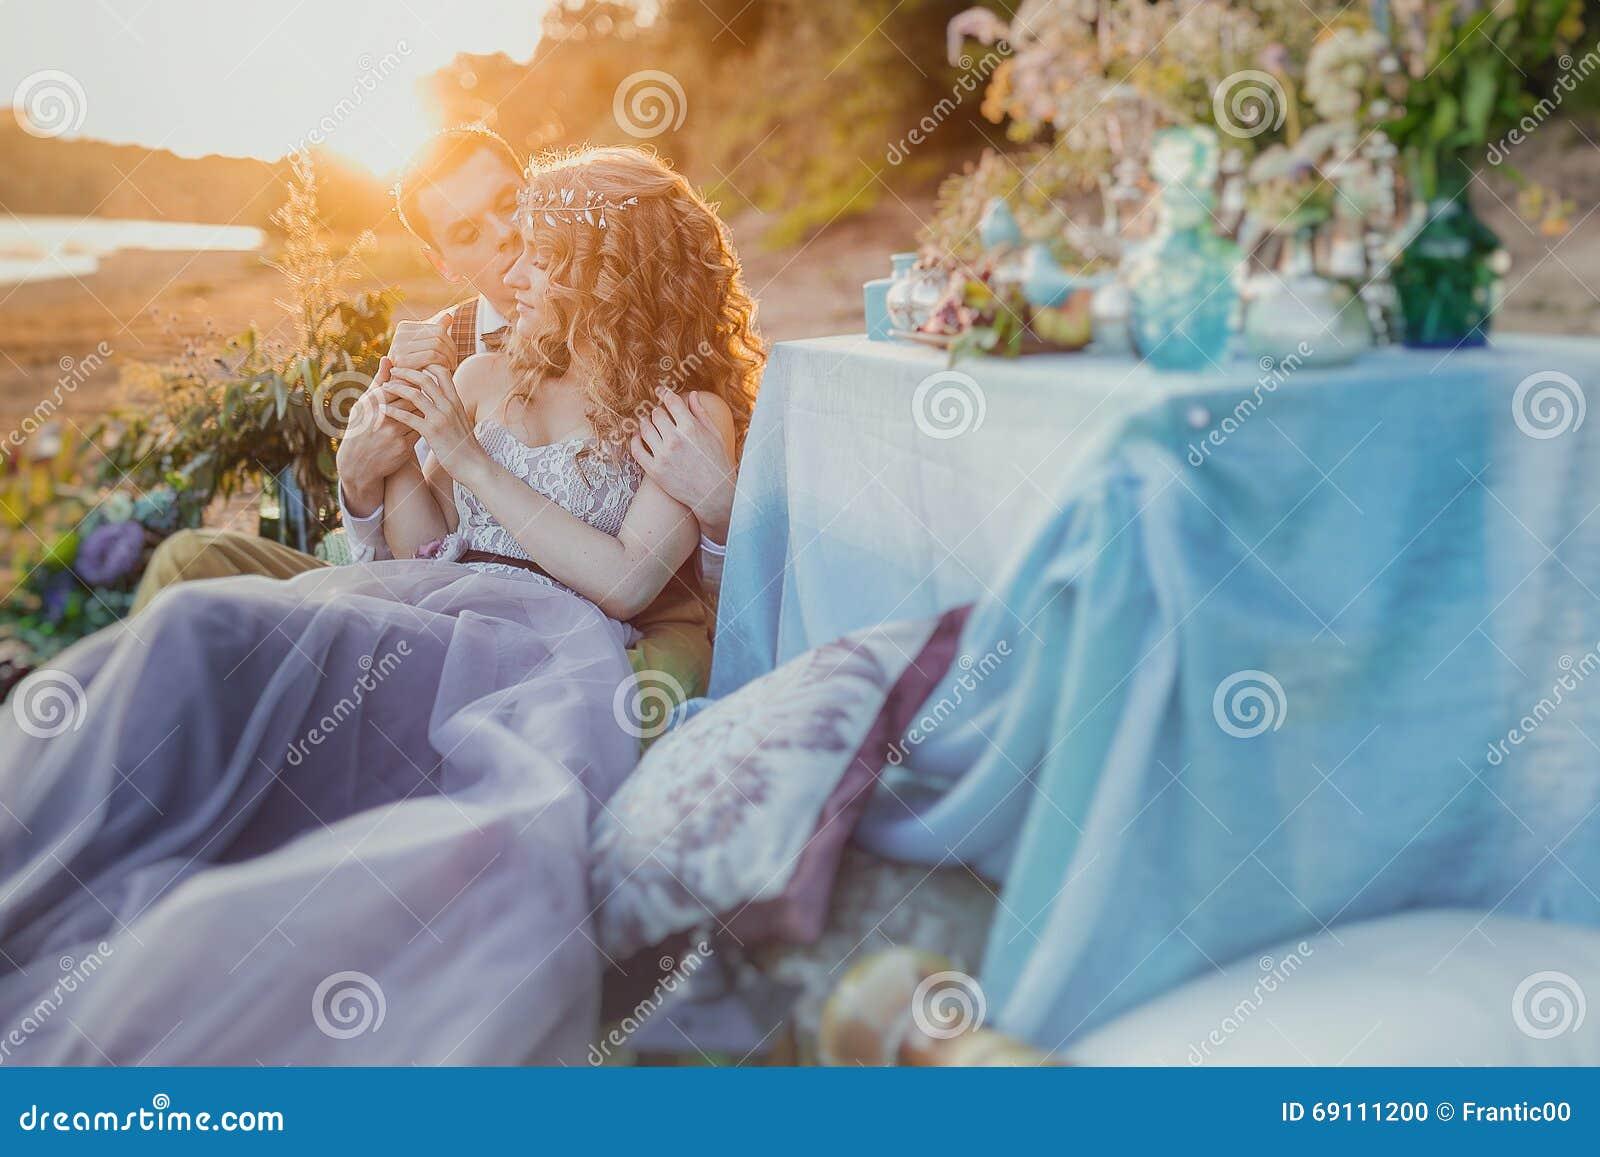 Caribbean Boho Wedding Inspiration: Boho Chic Couple In Love The Bride And Groom. Wedding